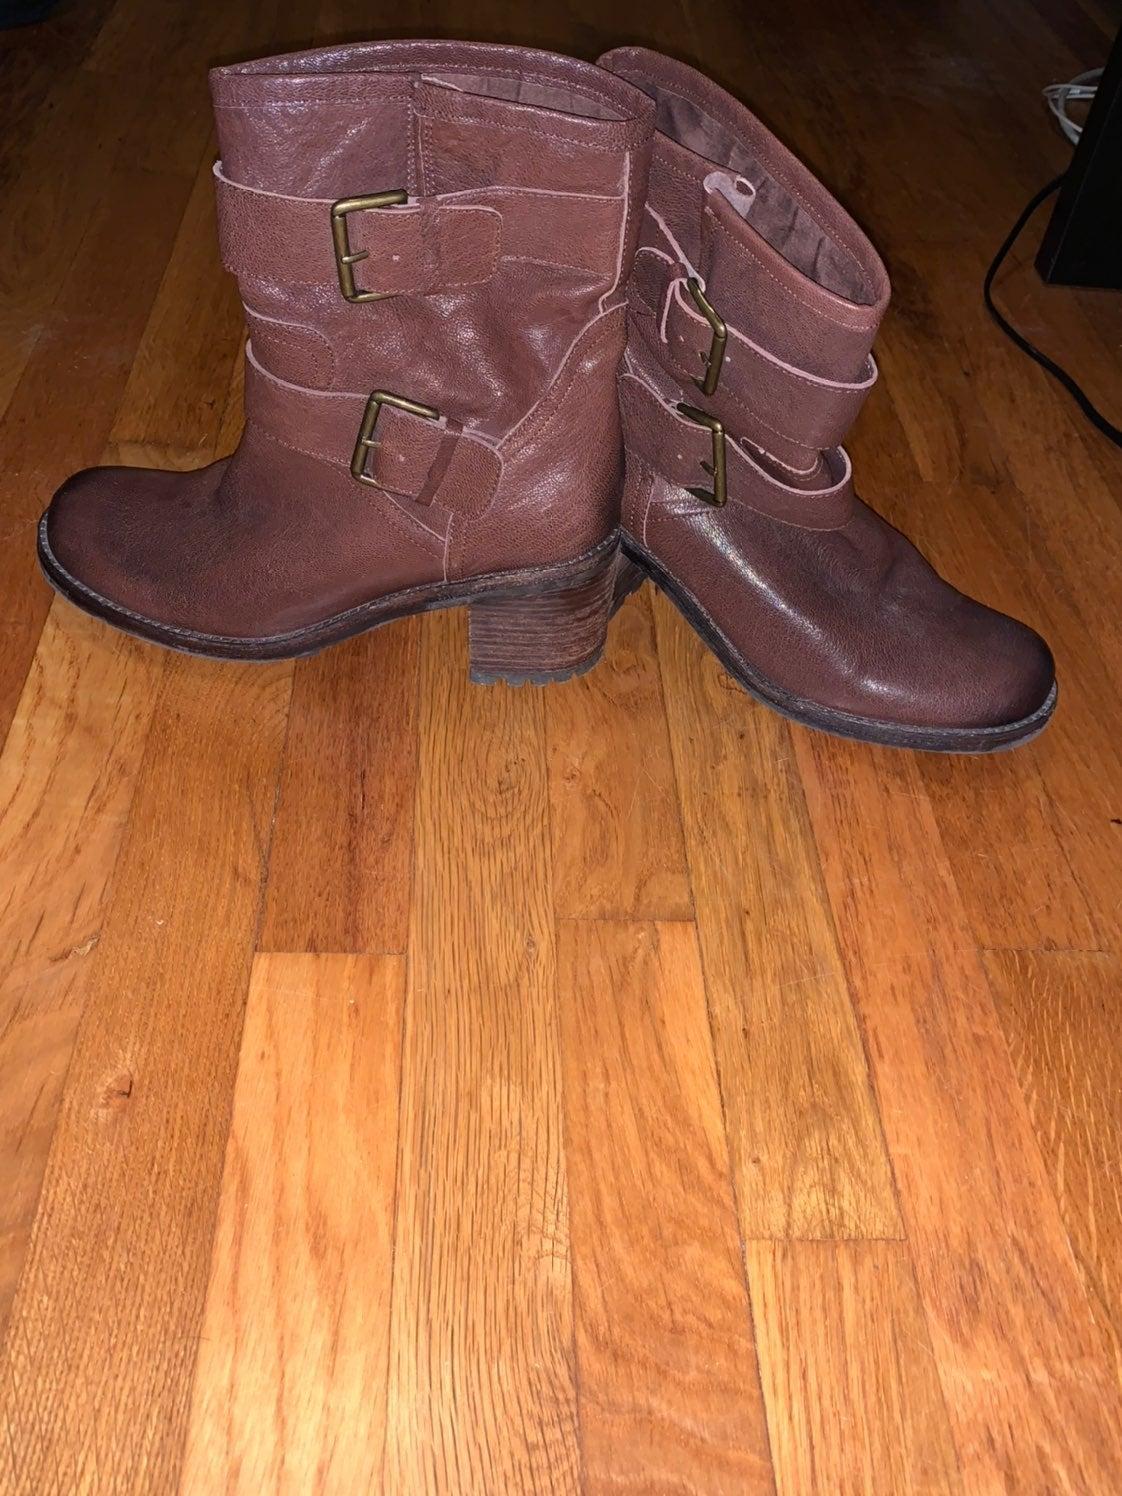 Sam Edelman heeled boots size 9.5